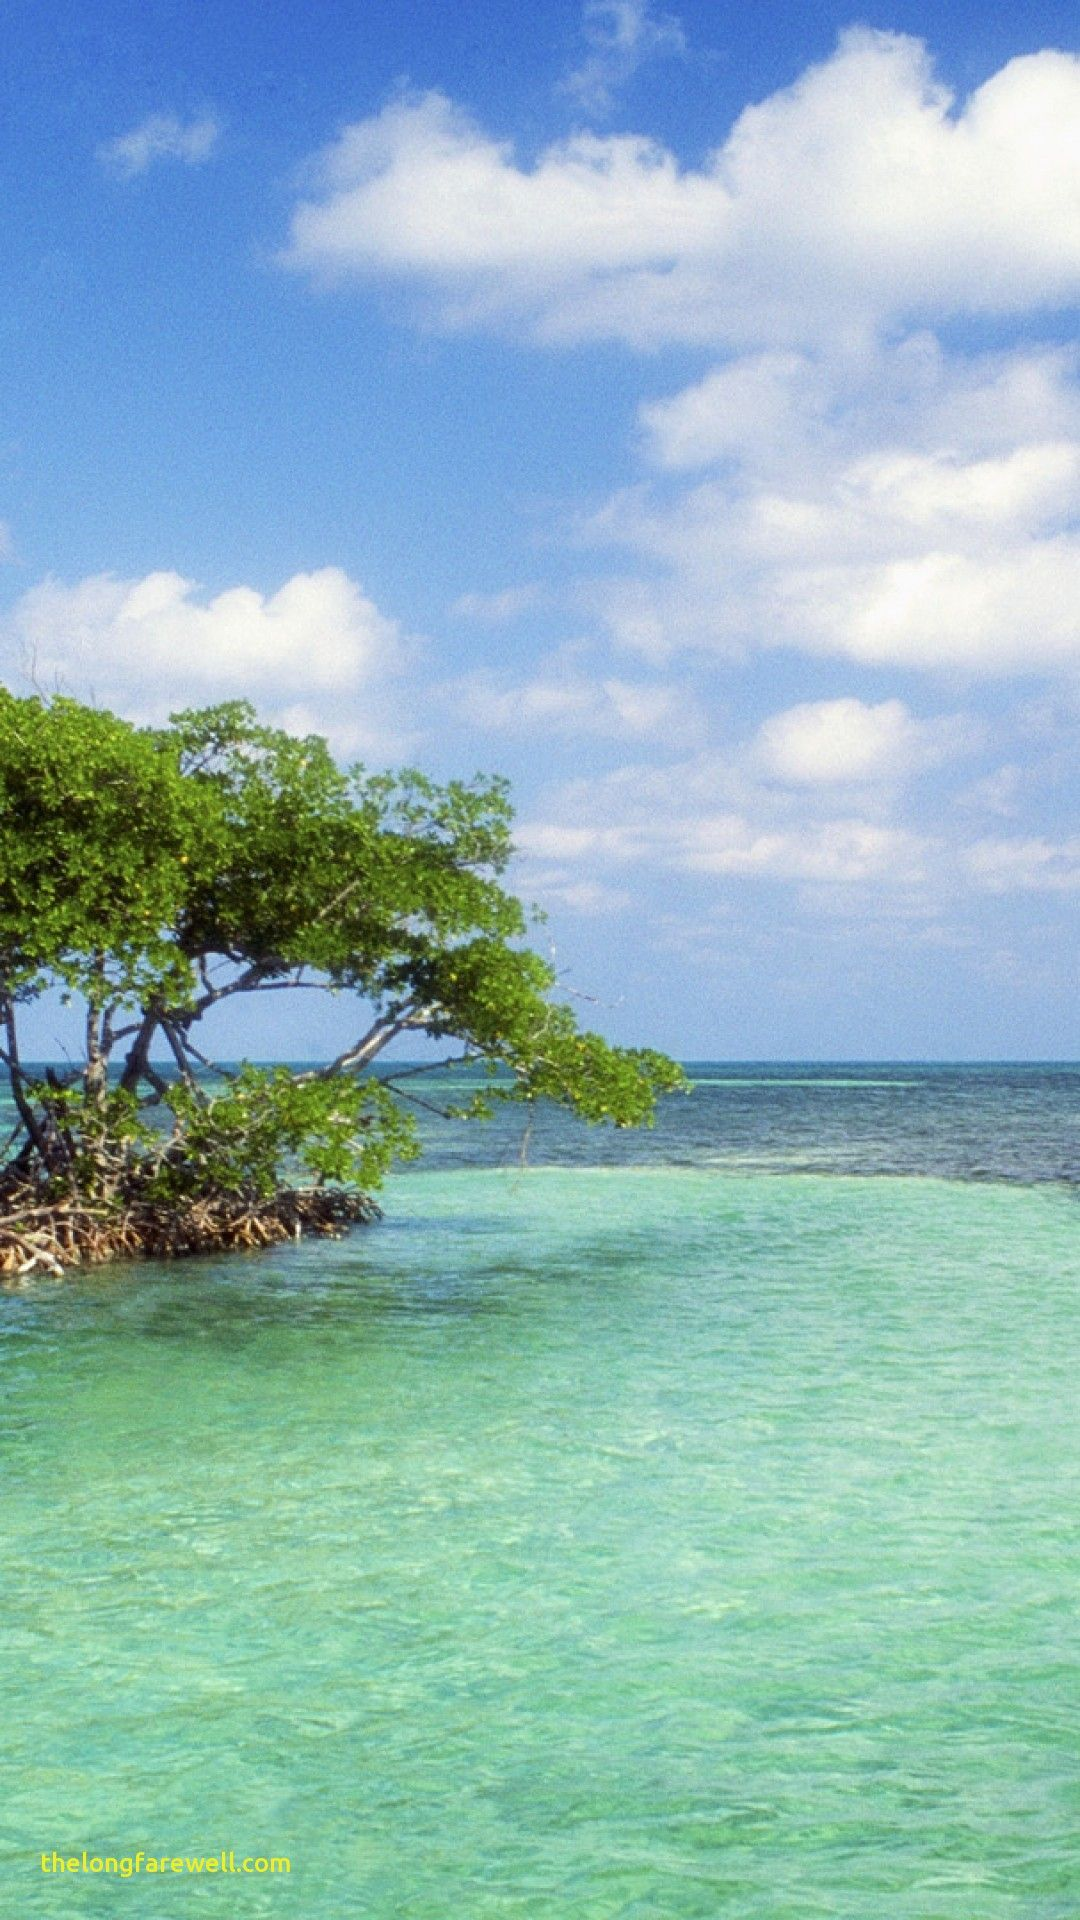 Island Iphone Wallpapers Top Free Island Iphone